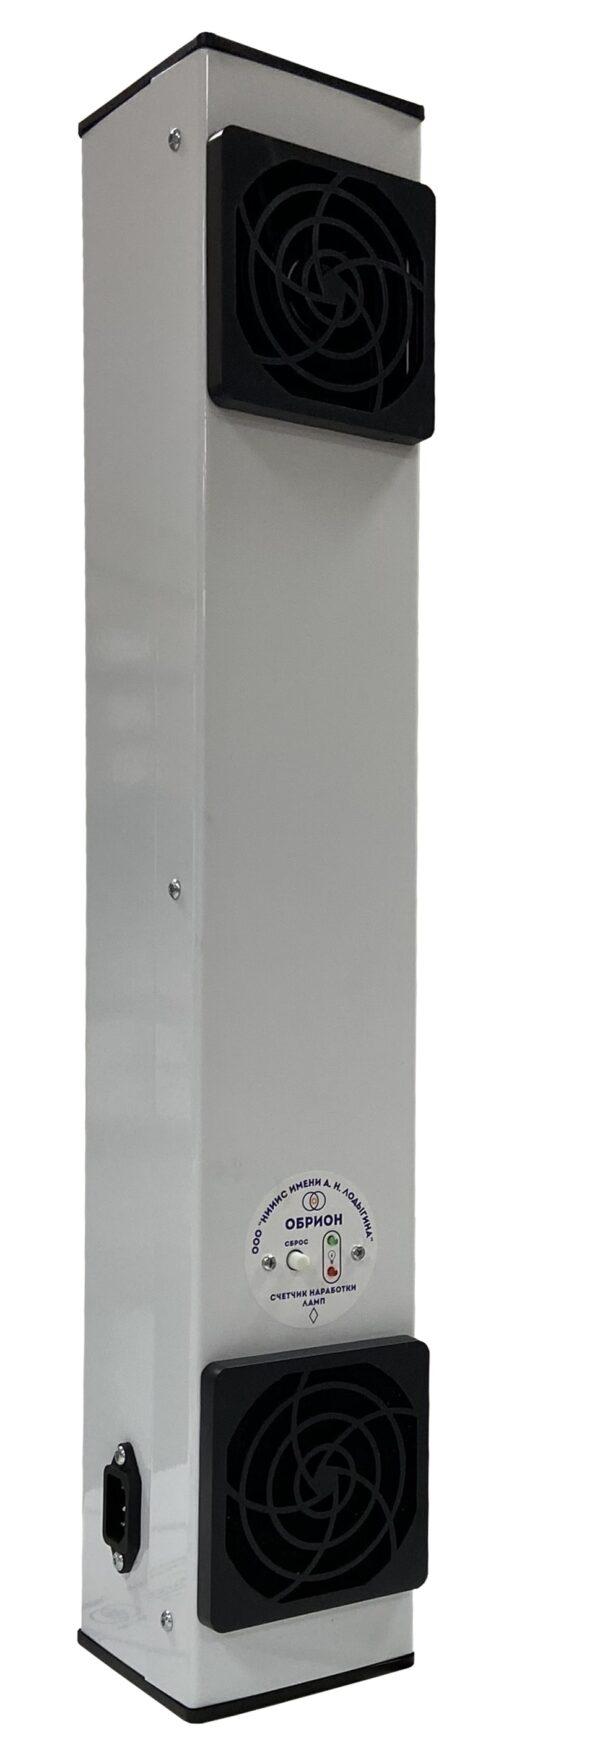 РБО01-2х15-001 ОБРИОН-2